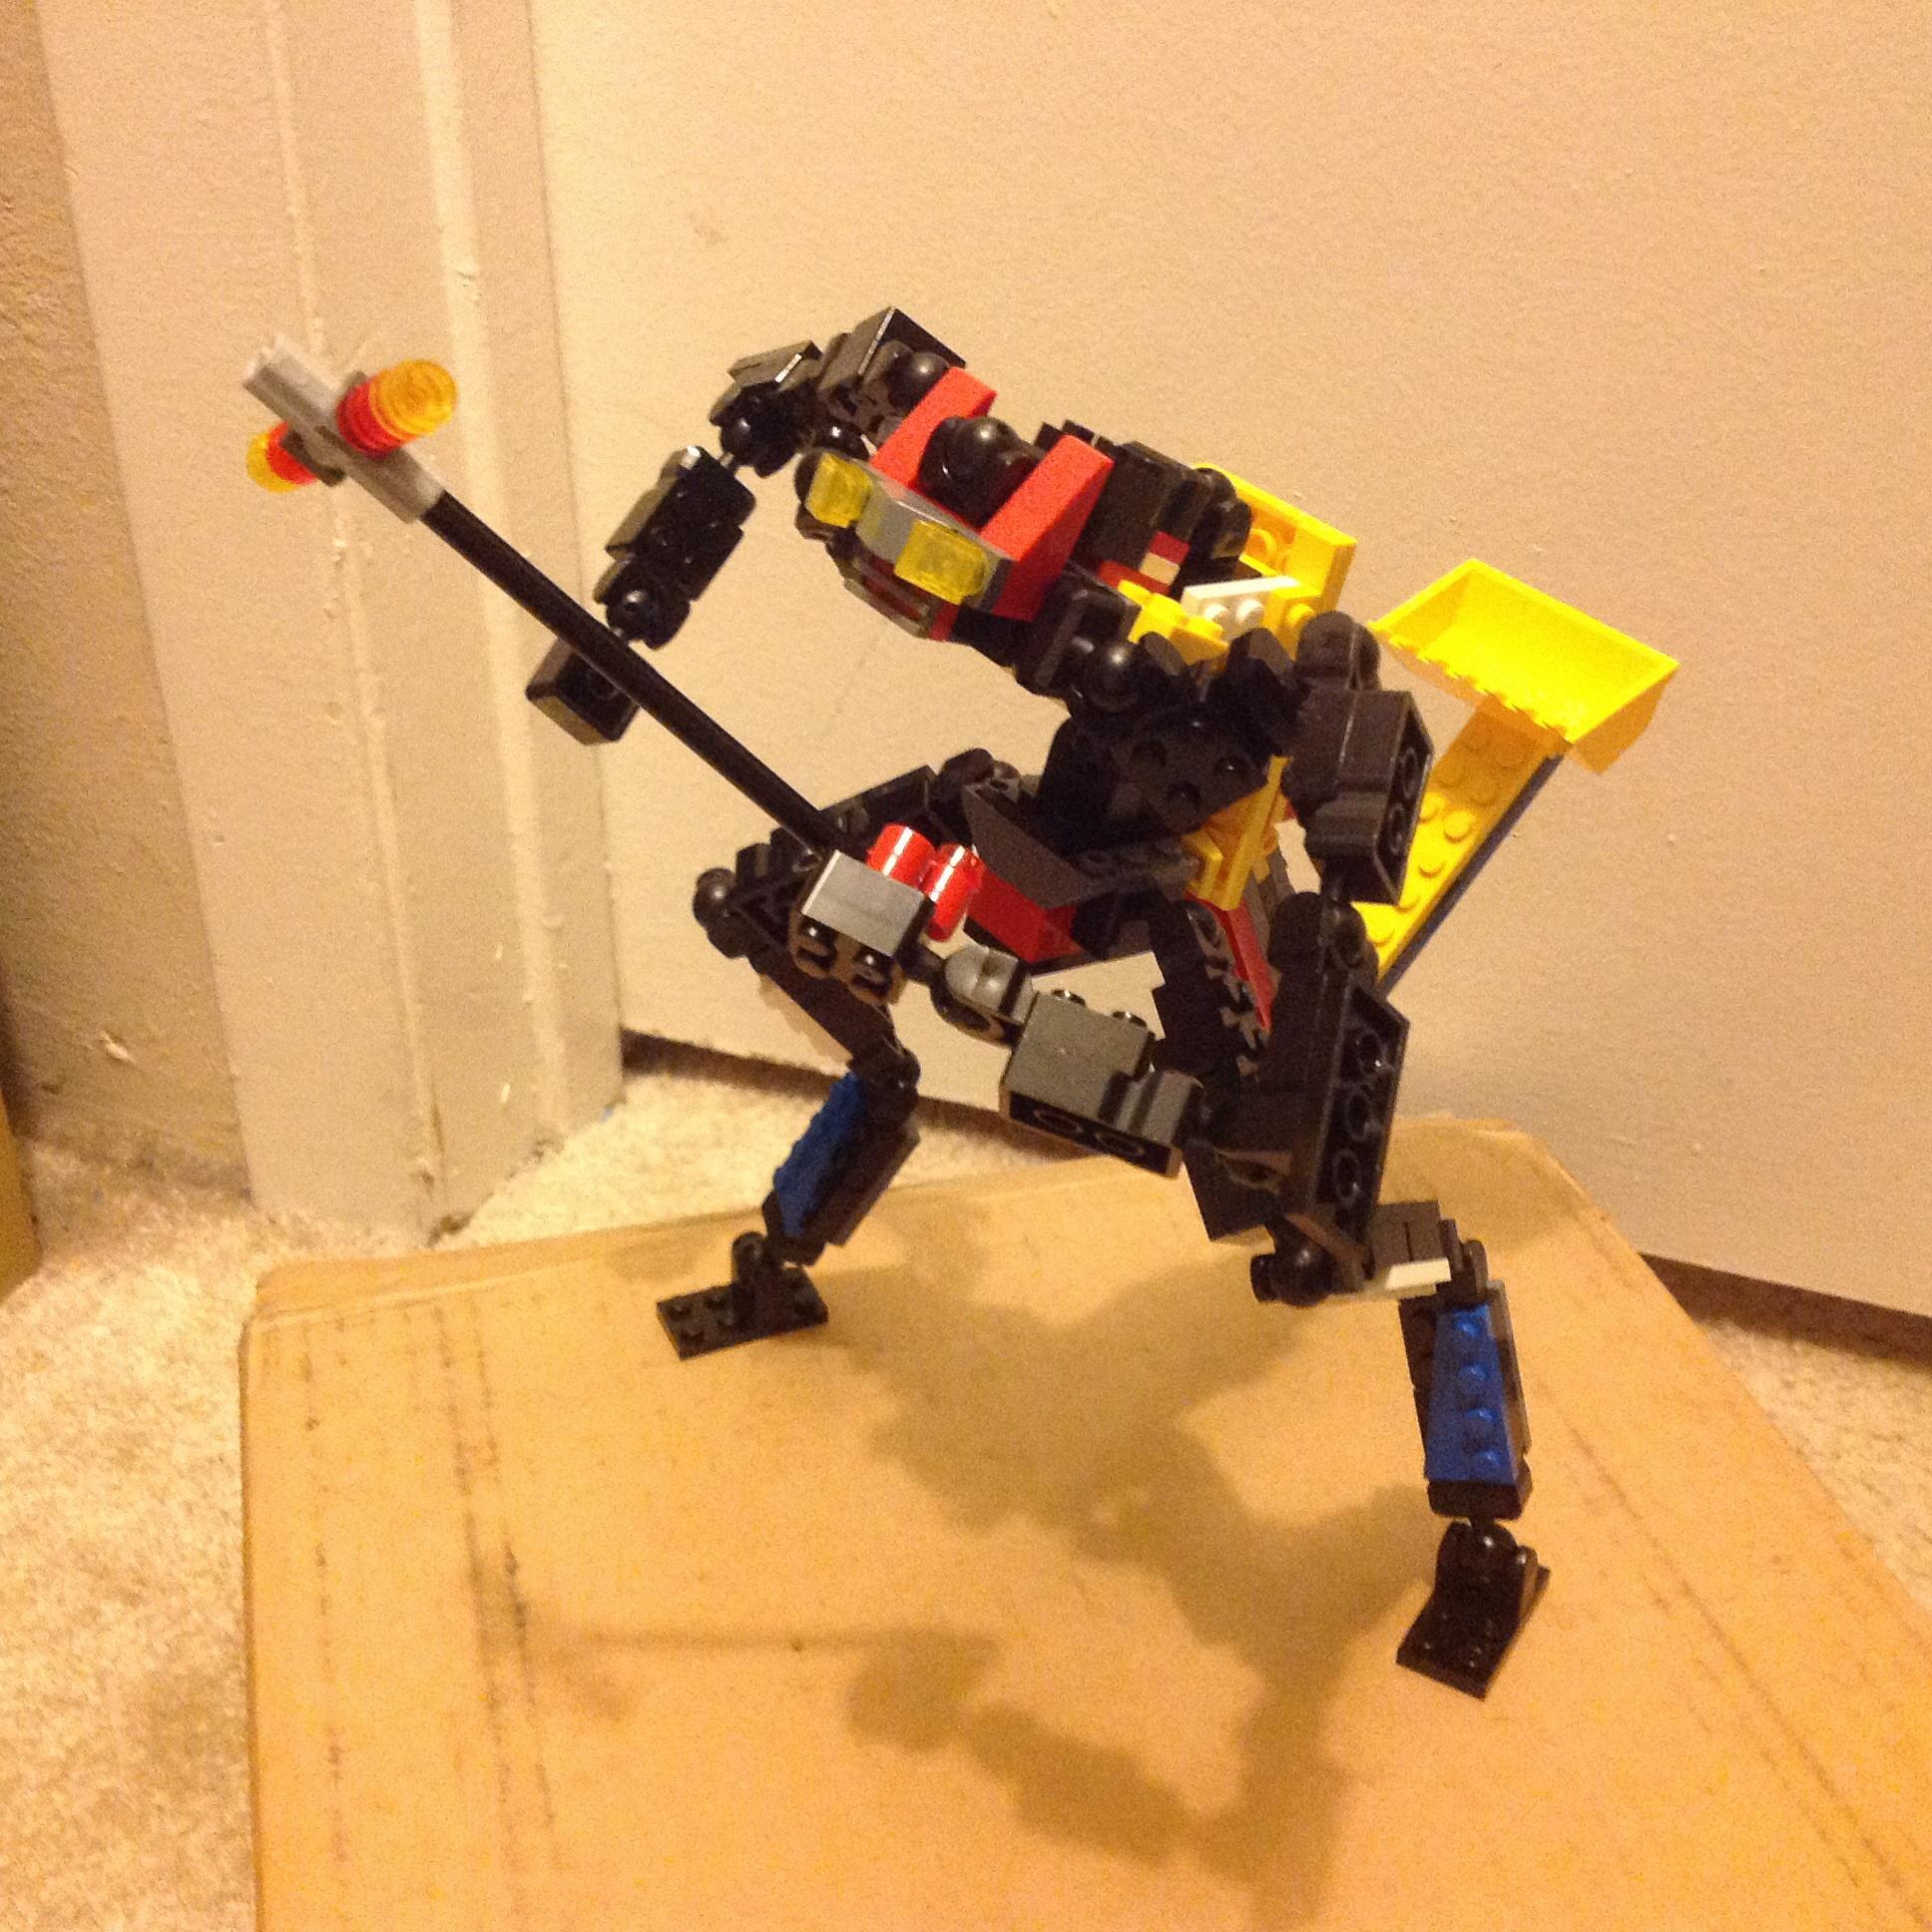 Lego Transformer... Autobot? Lost Constructicon? You Decide!